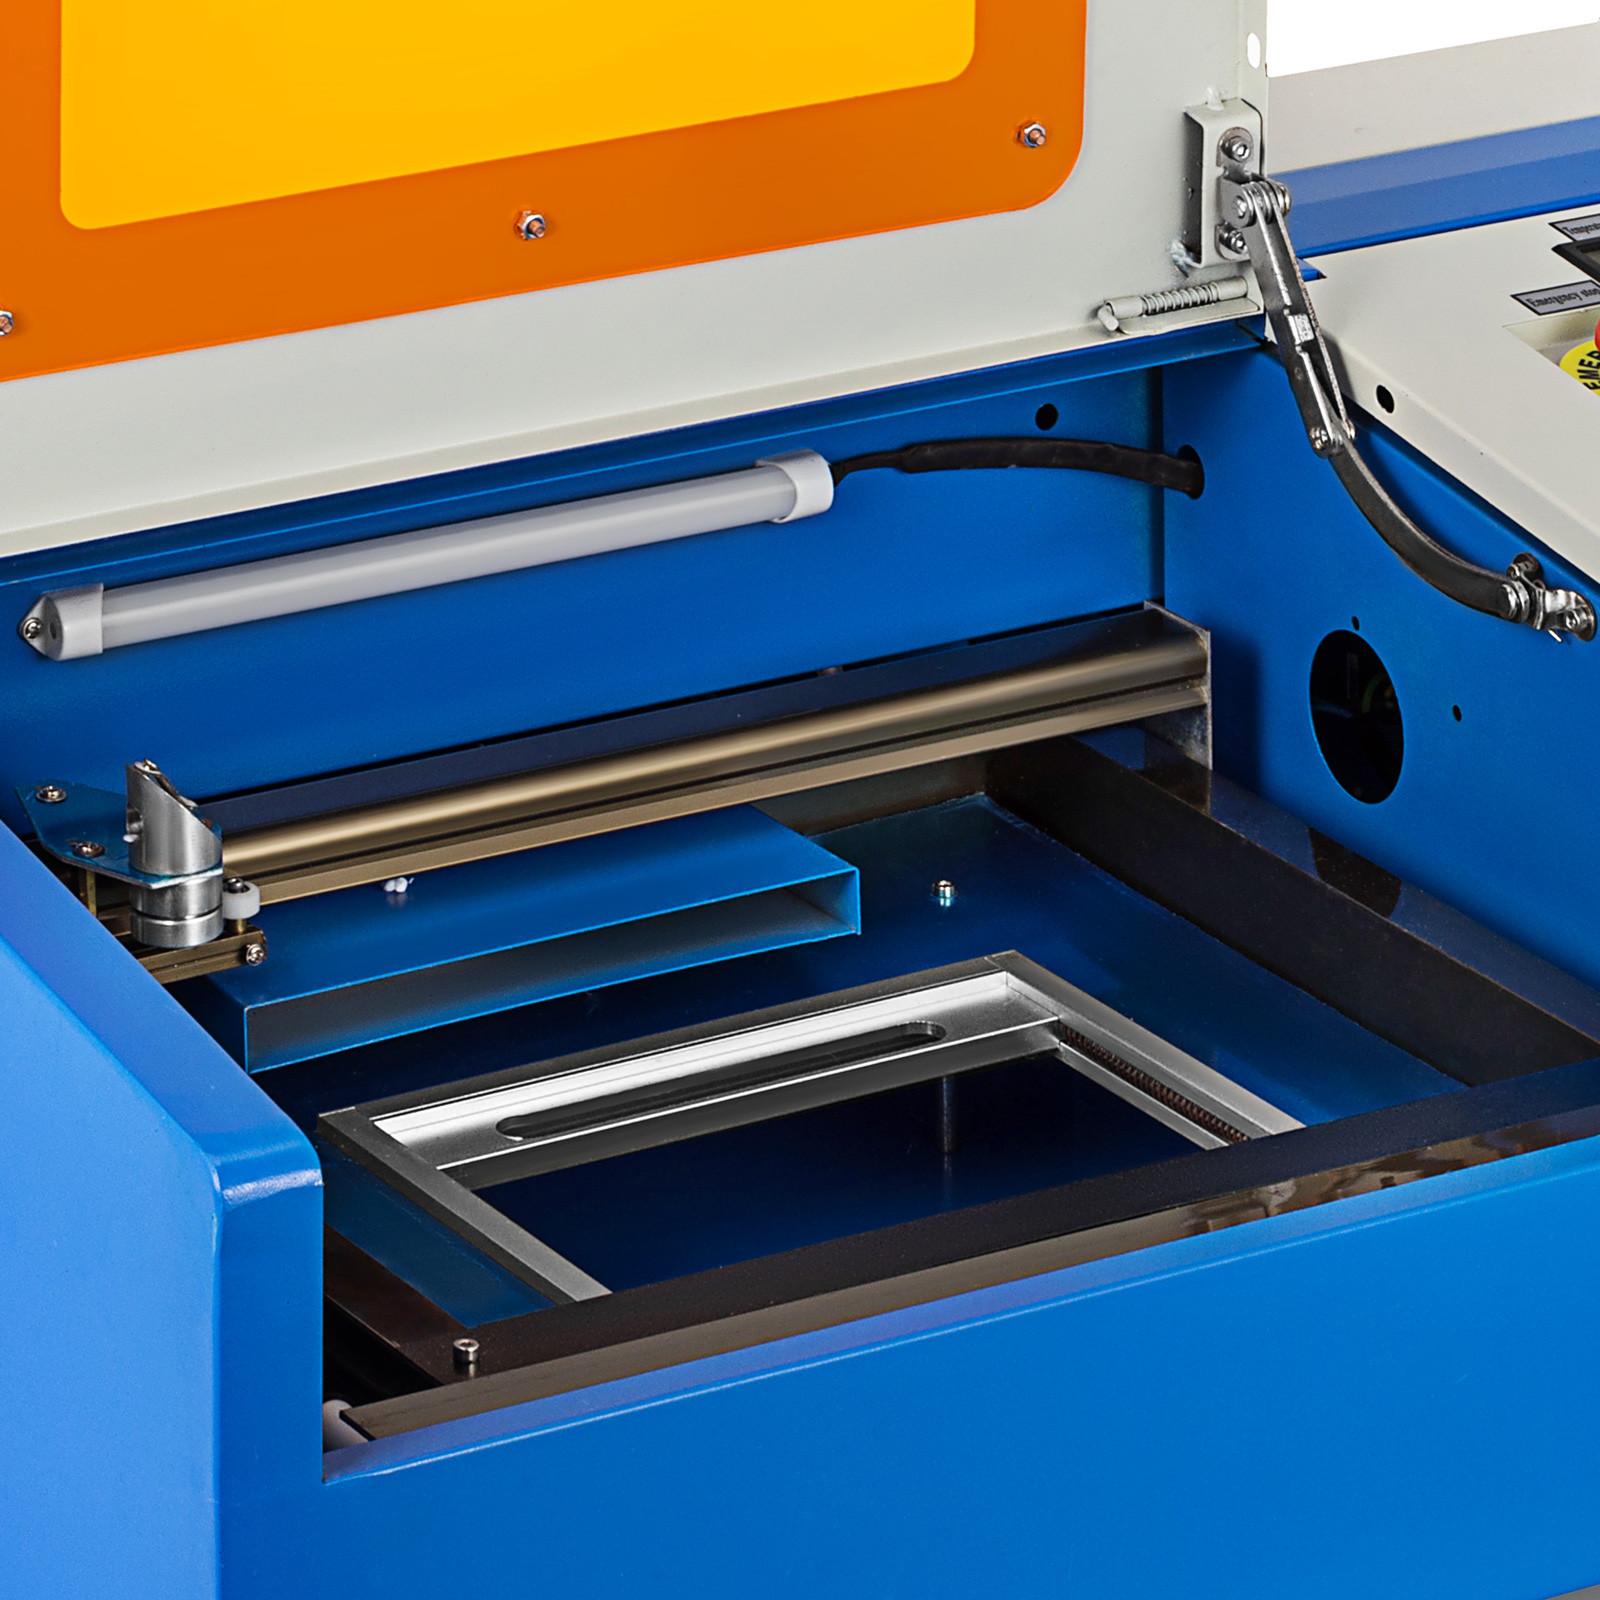 Macchina-per-Incisione-Laser-CO2-40-130W-Asse-Rotante-Tagliatrice-Incisore miniatura 102